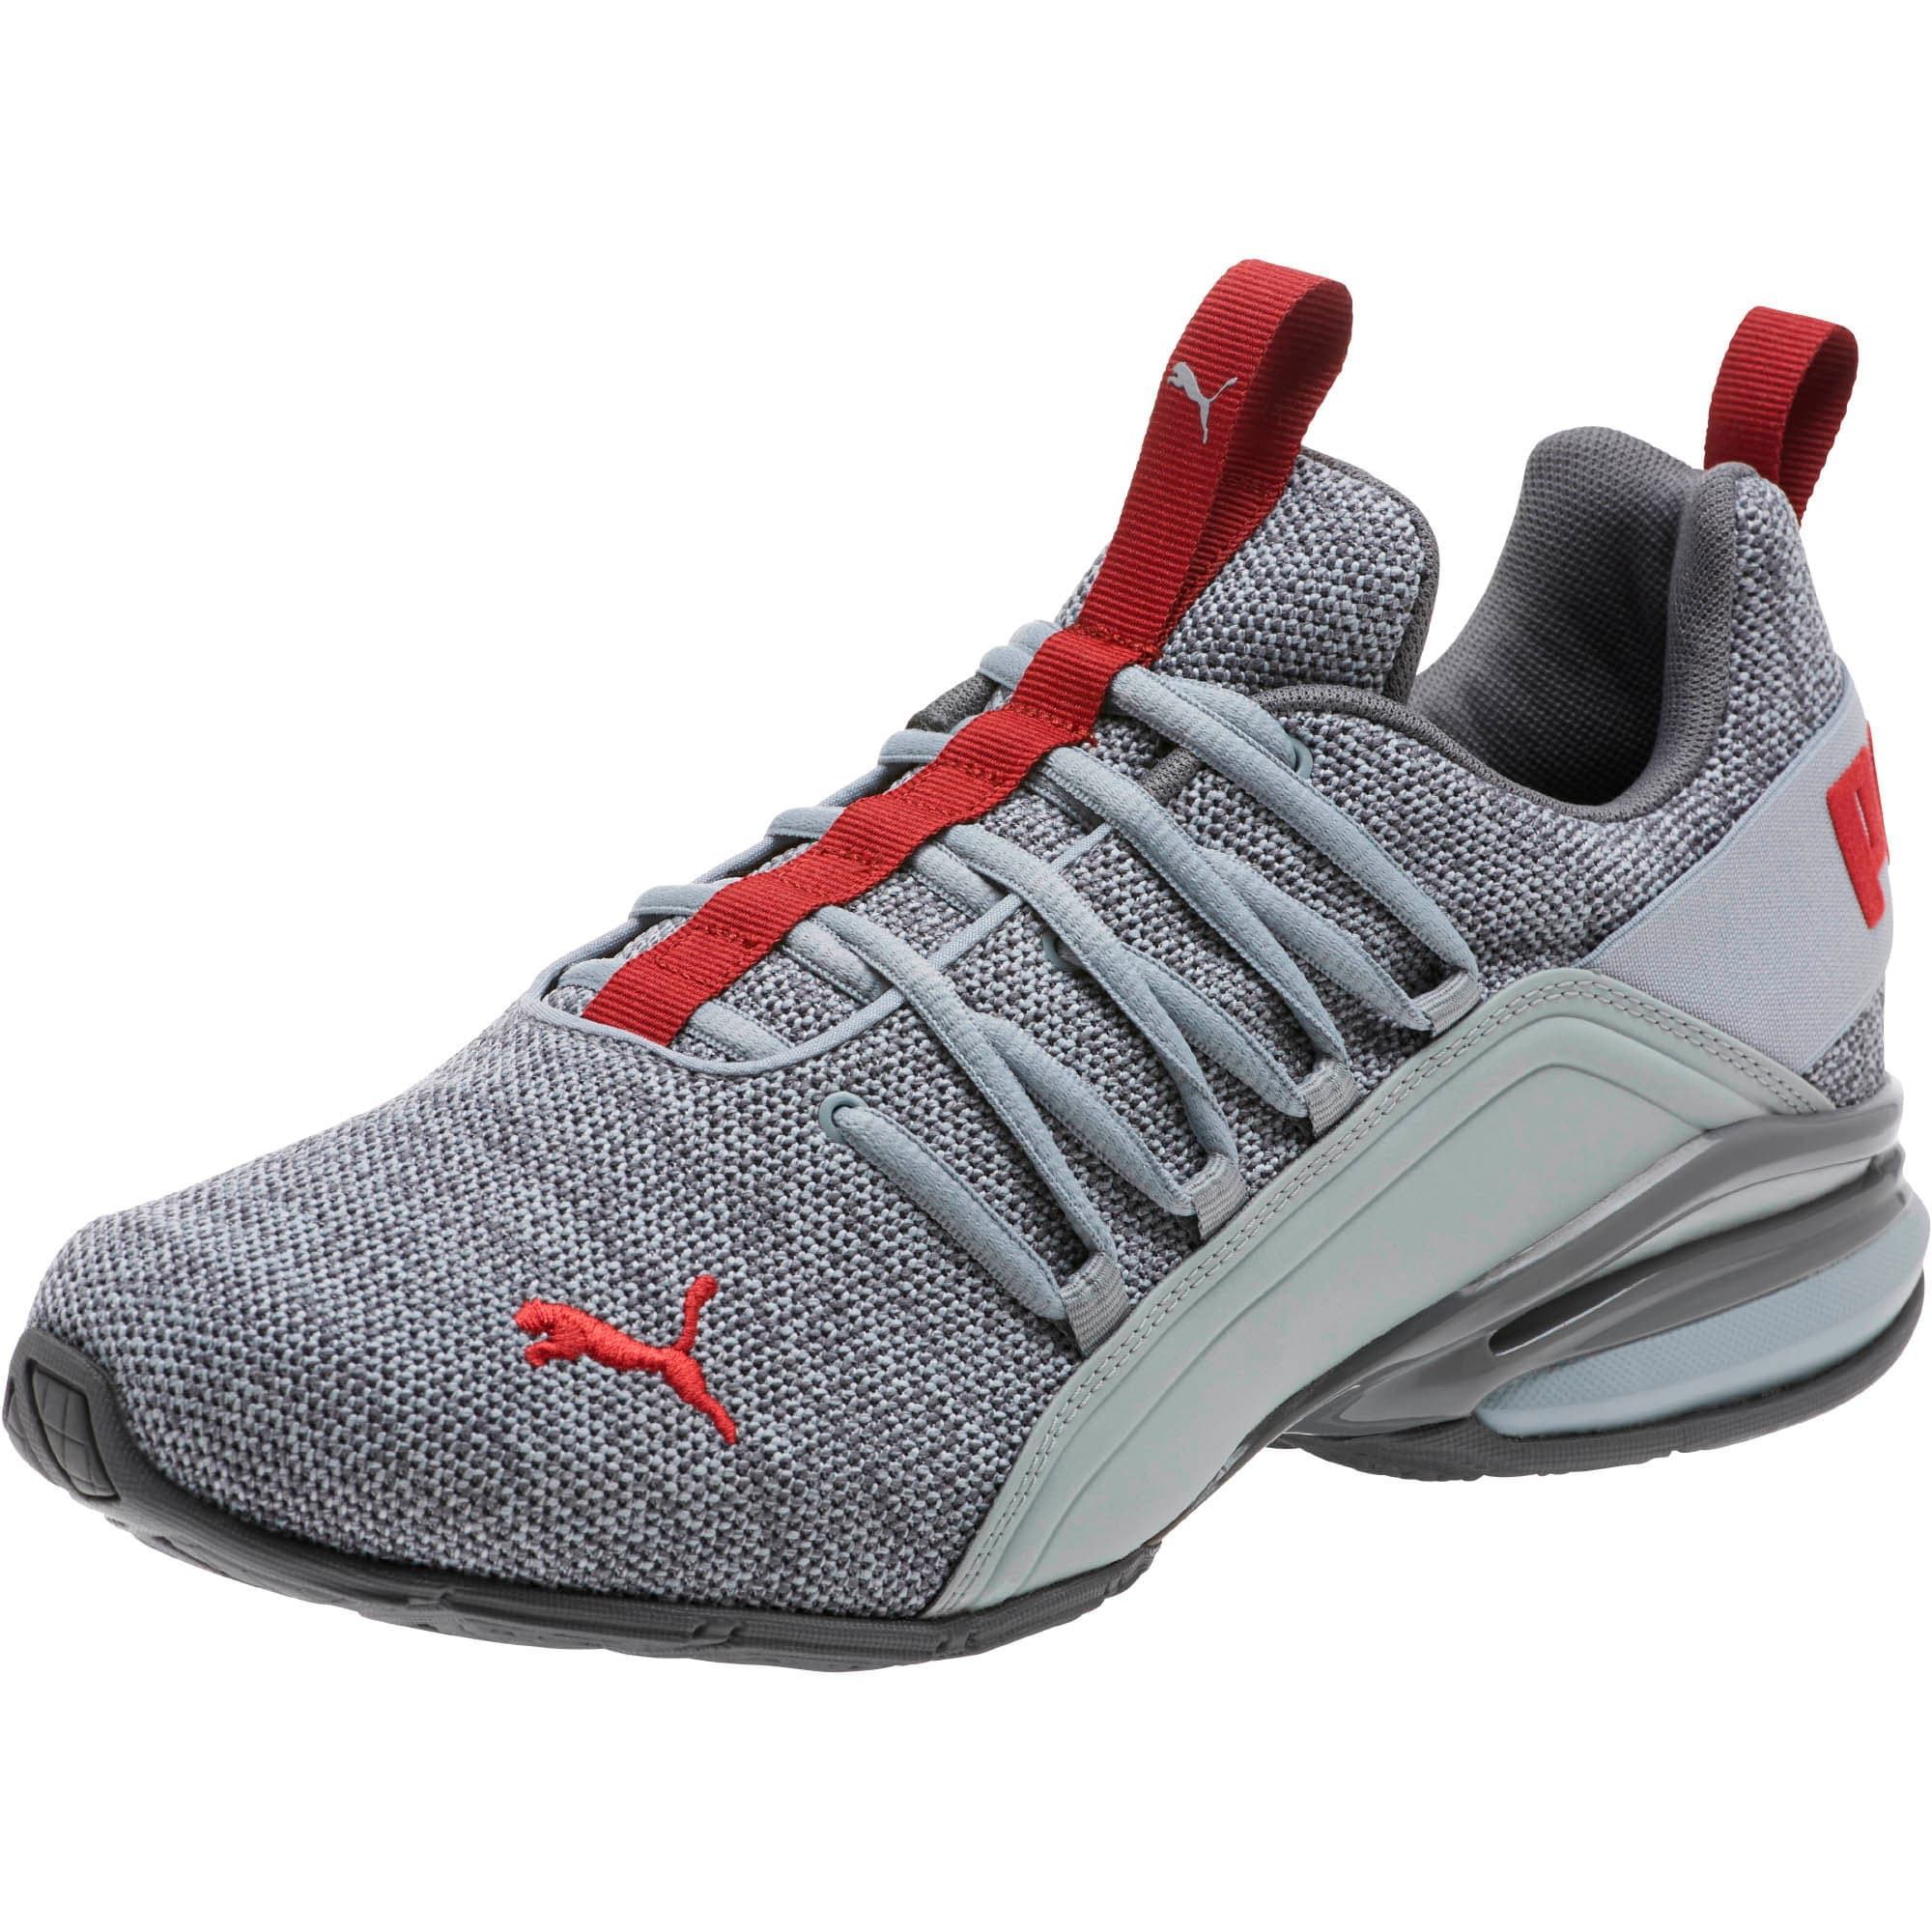 Thumbnail 1 of Axelion Men's Training Shoes, Quarry-QUIET SHADE-Red, medium